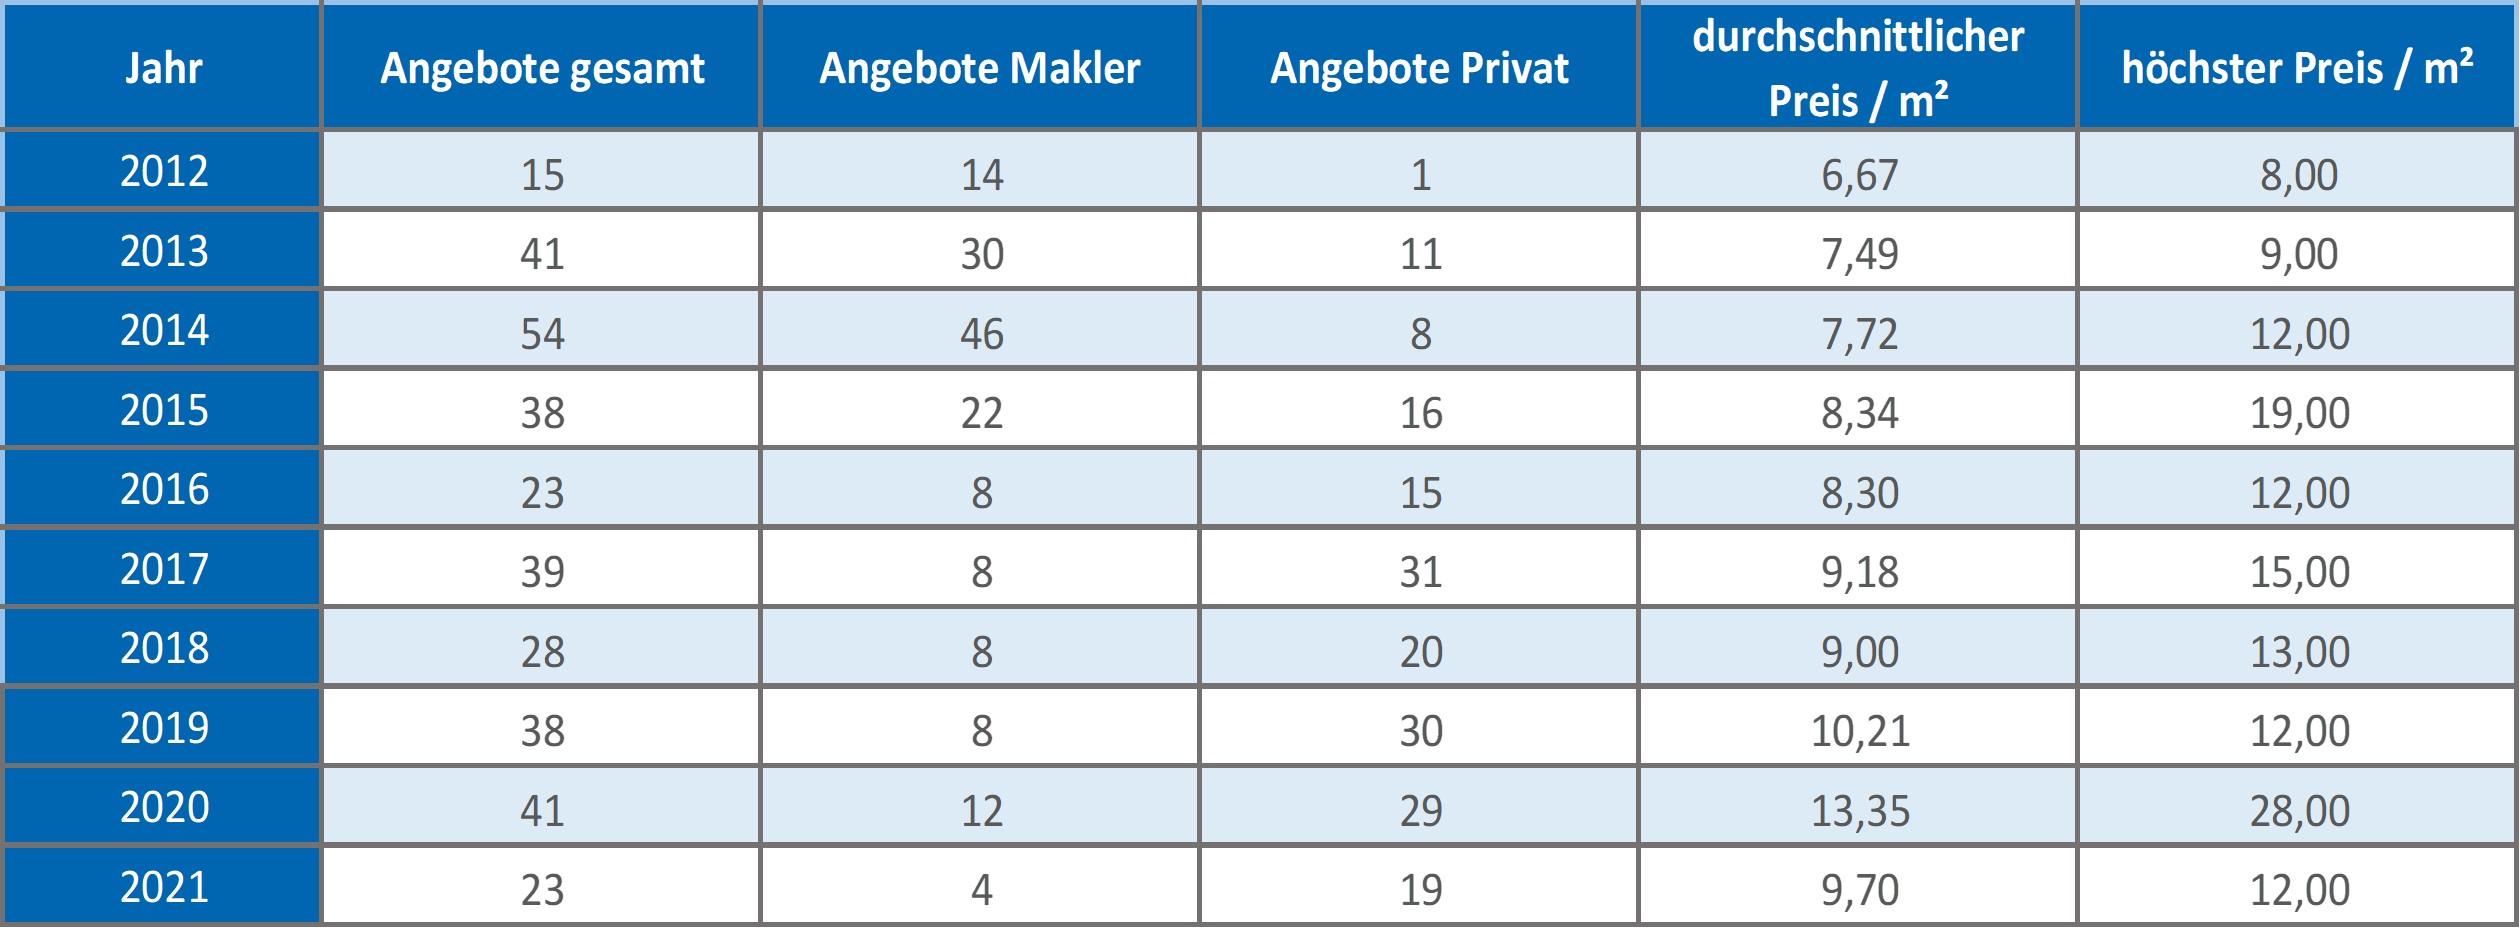 Steinhöring Mieten Vermieten Miete Bewertung Makler www.happy-immo.de 2019 2020 2021